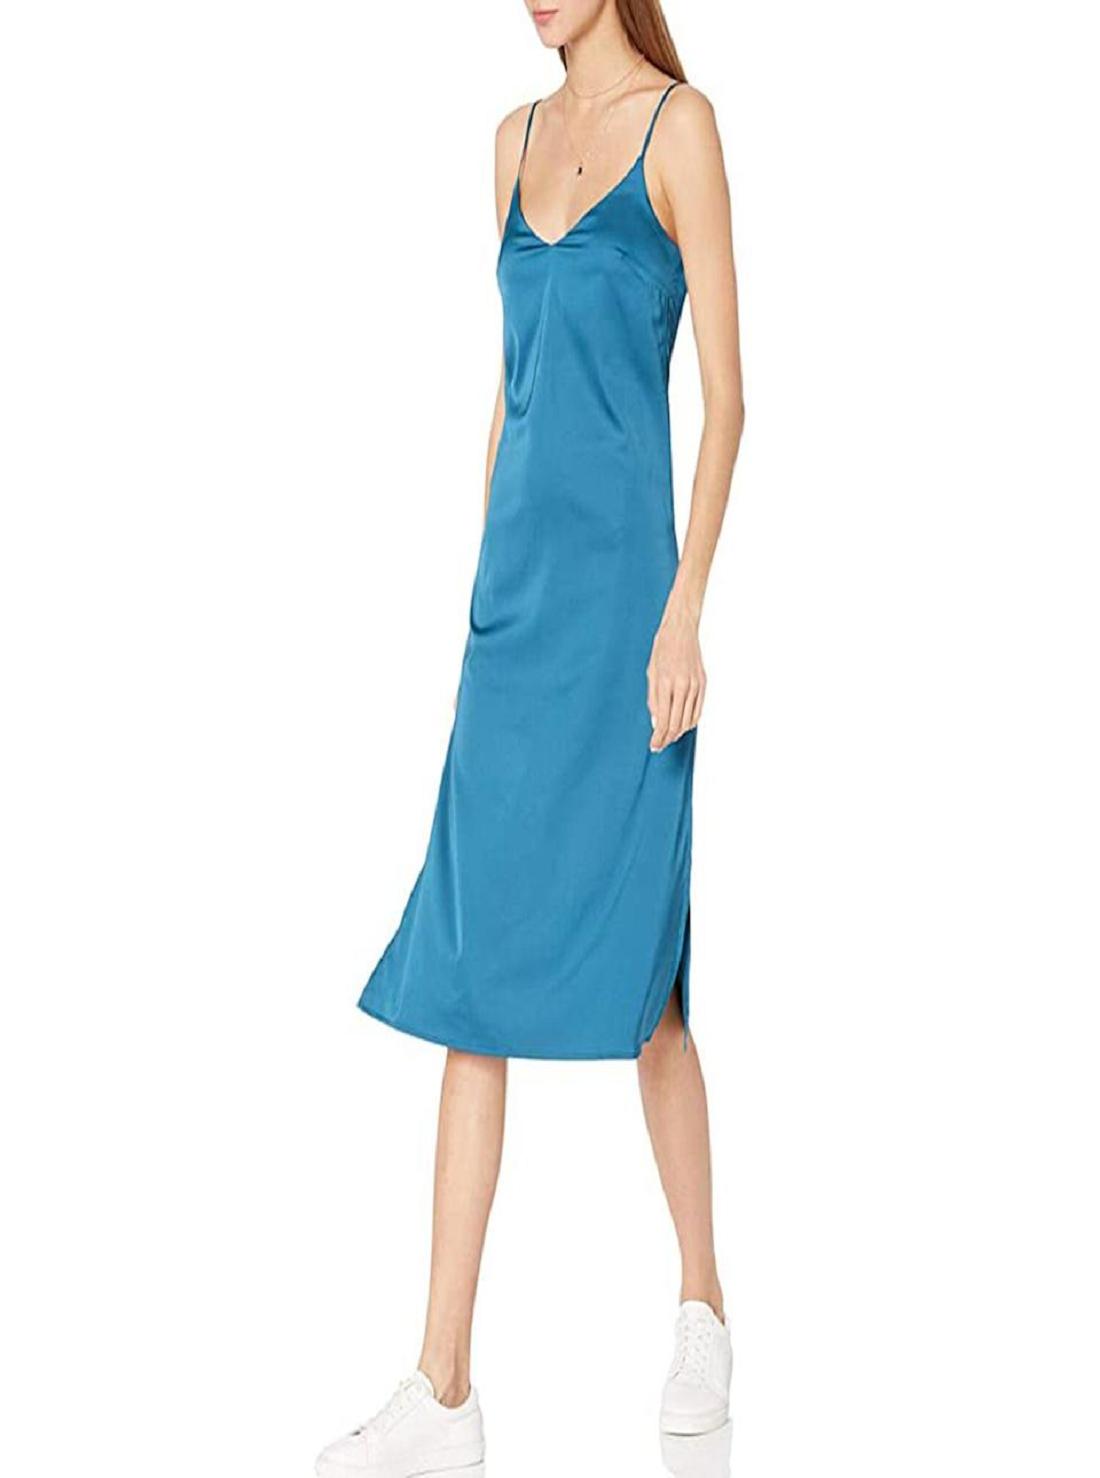 8 Wholesale Satin Summer Dress